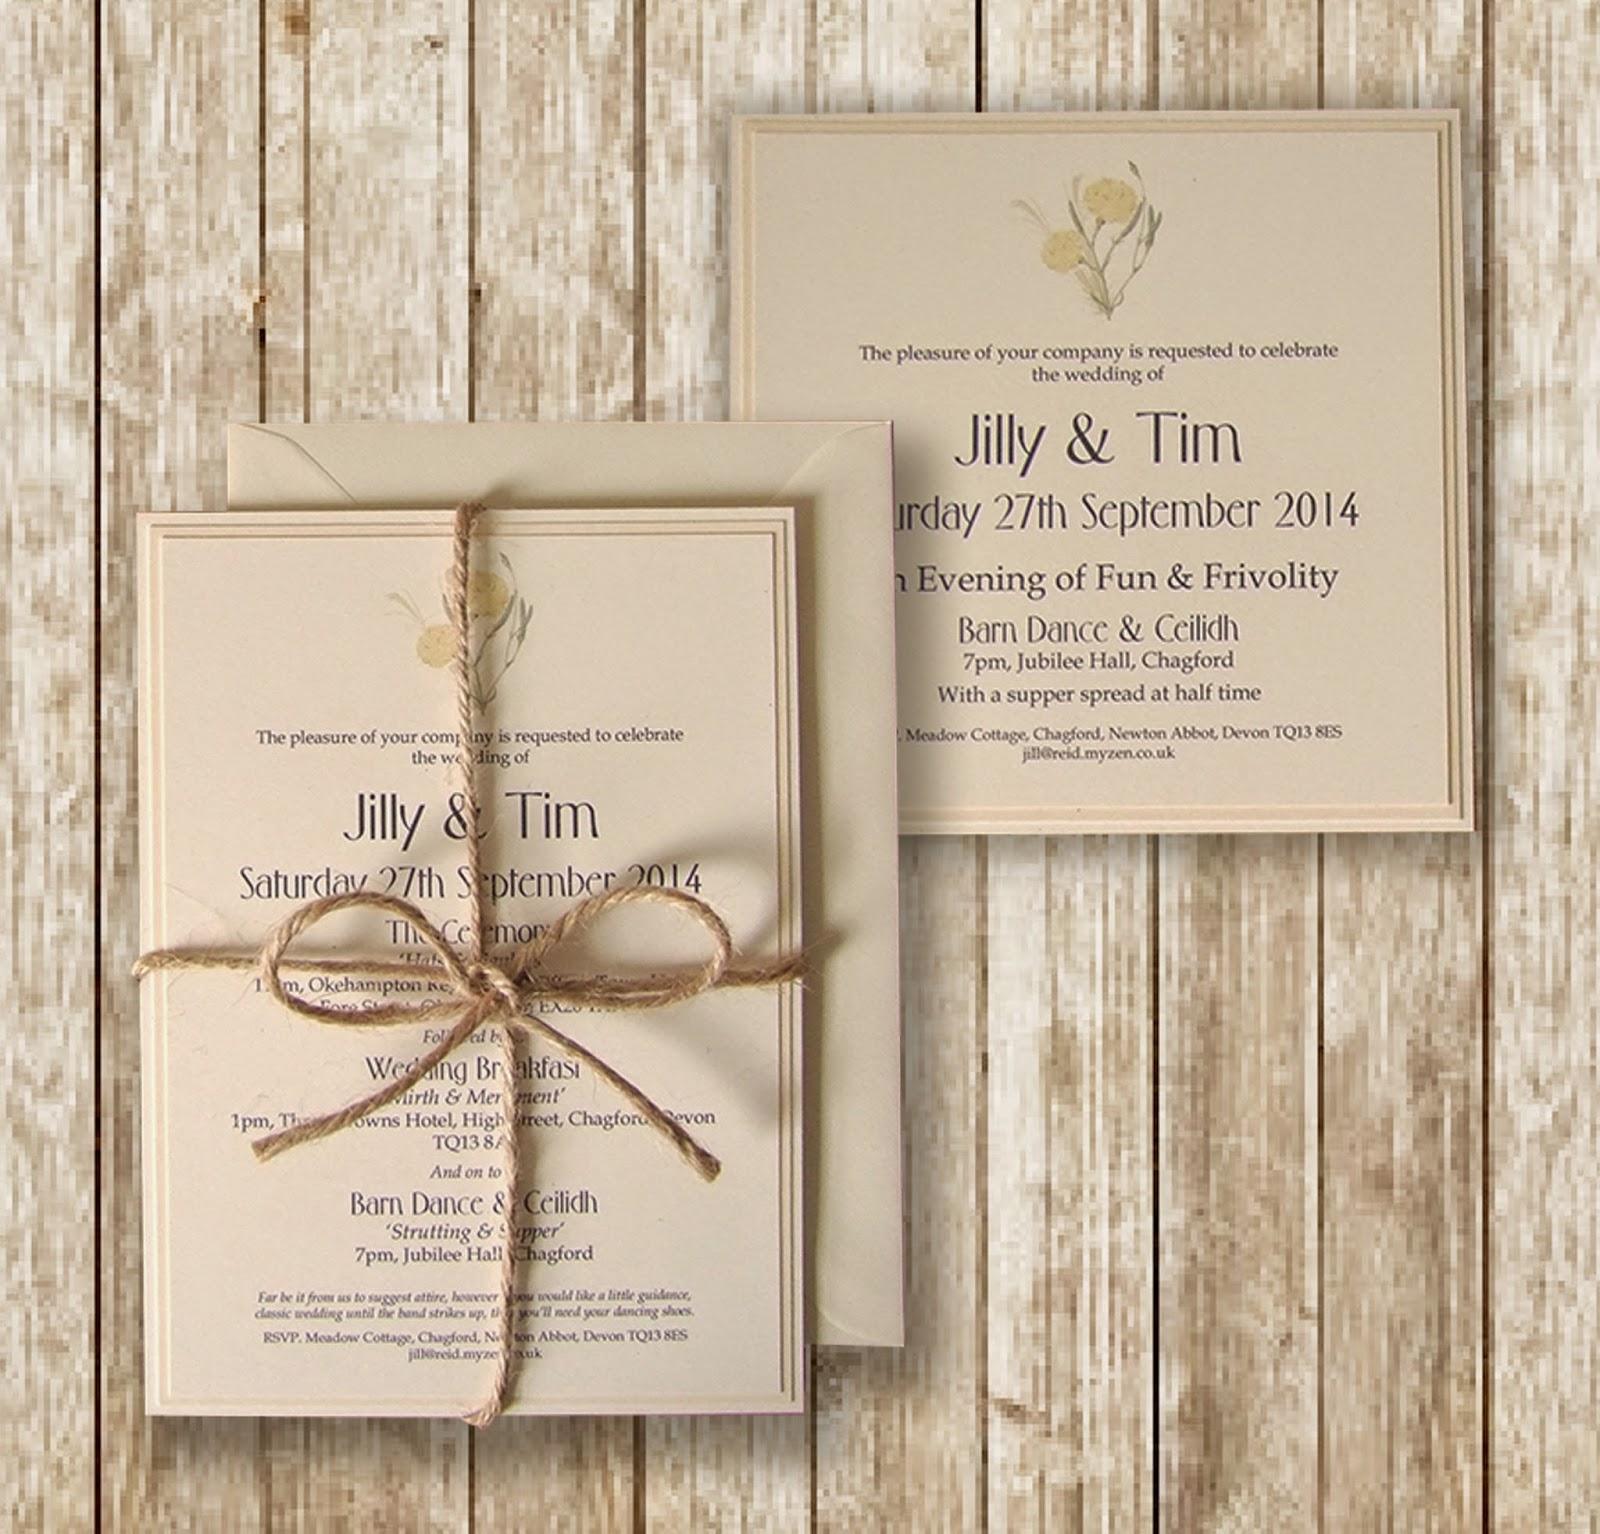 Knots and Kisses Wedding Stationery: Rustic Lemon & Cream Wedding ...